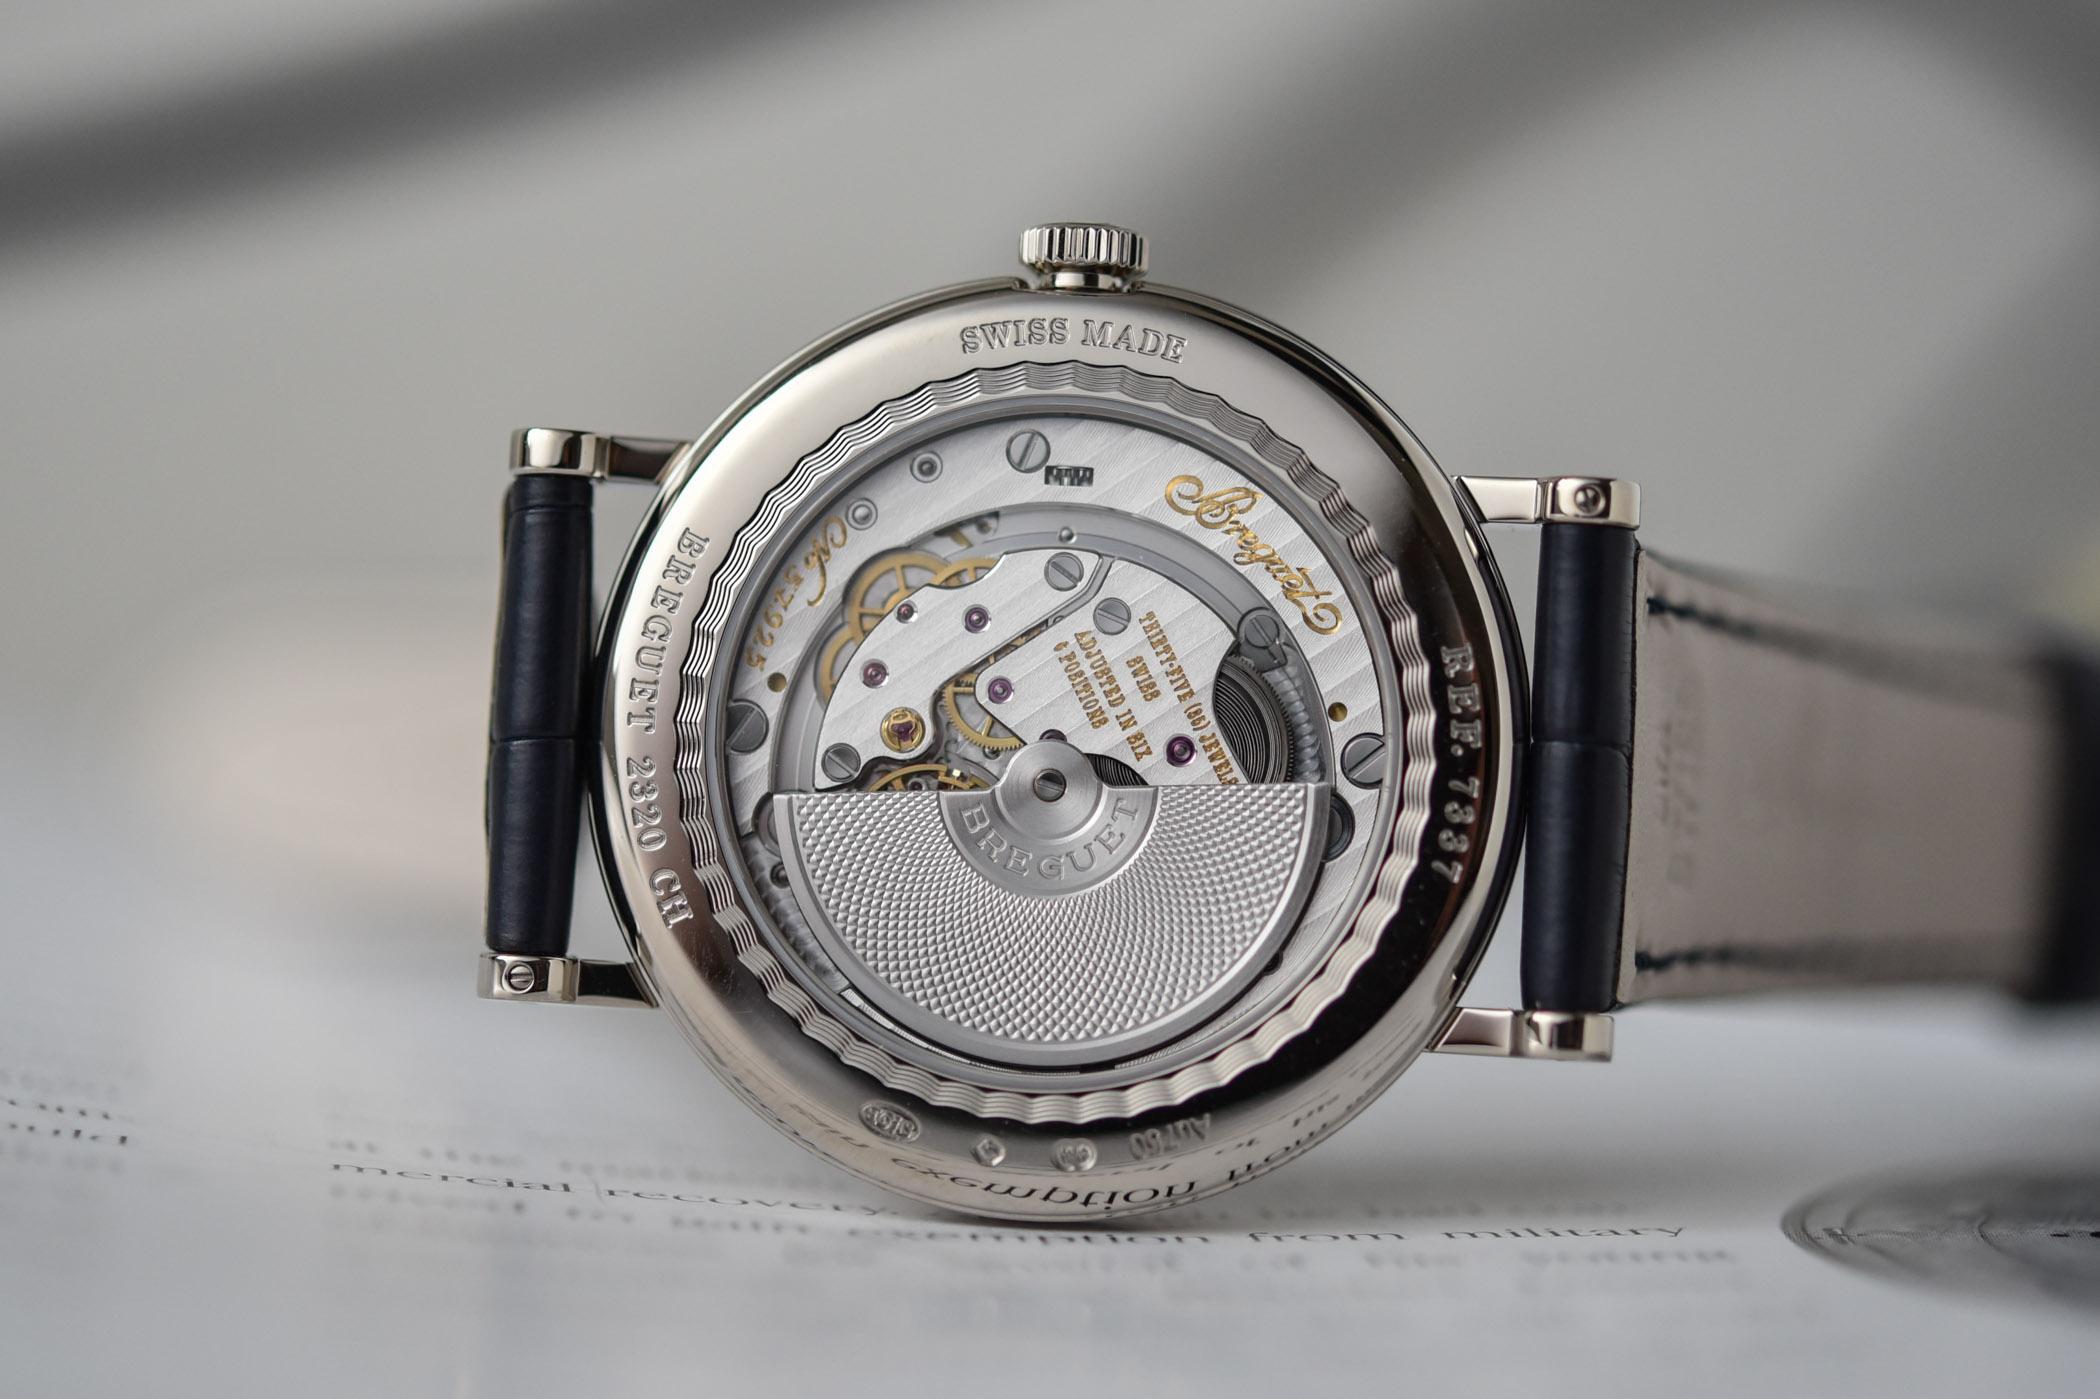 2020 Breguet Classique 7337 Moon and Calendar Chinoise